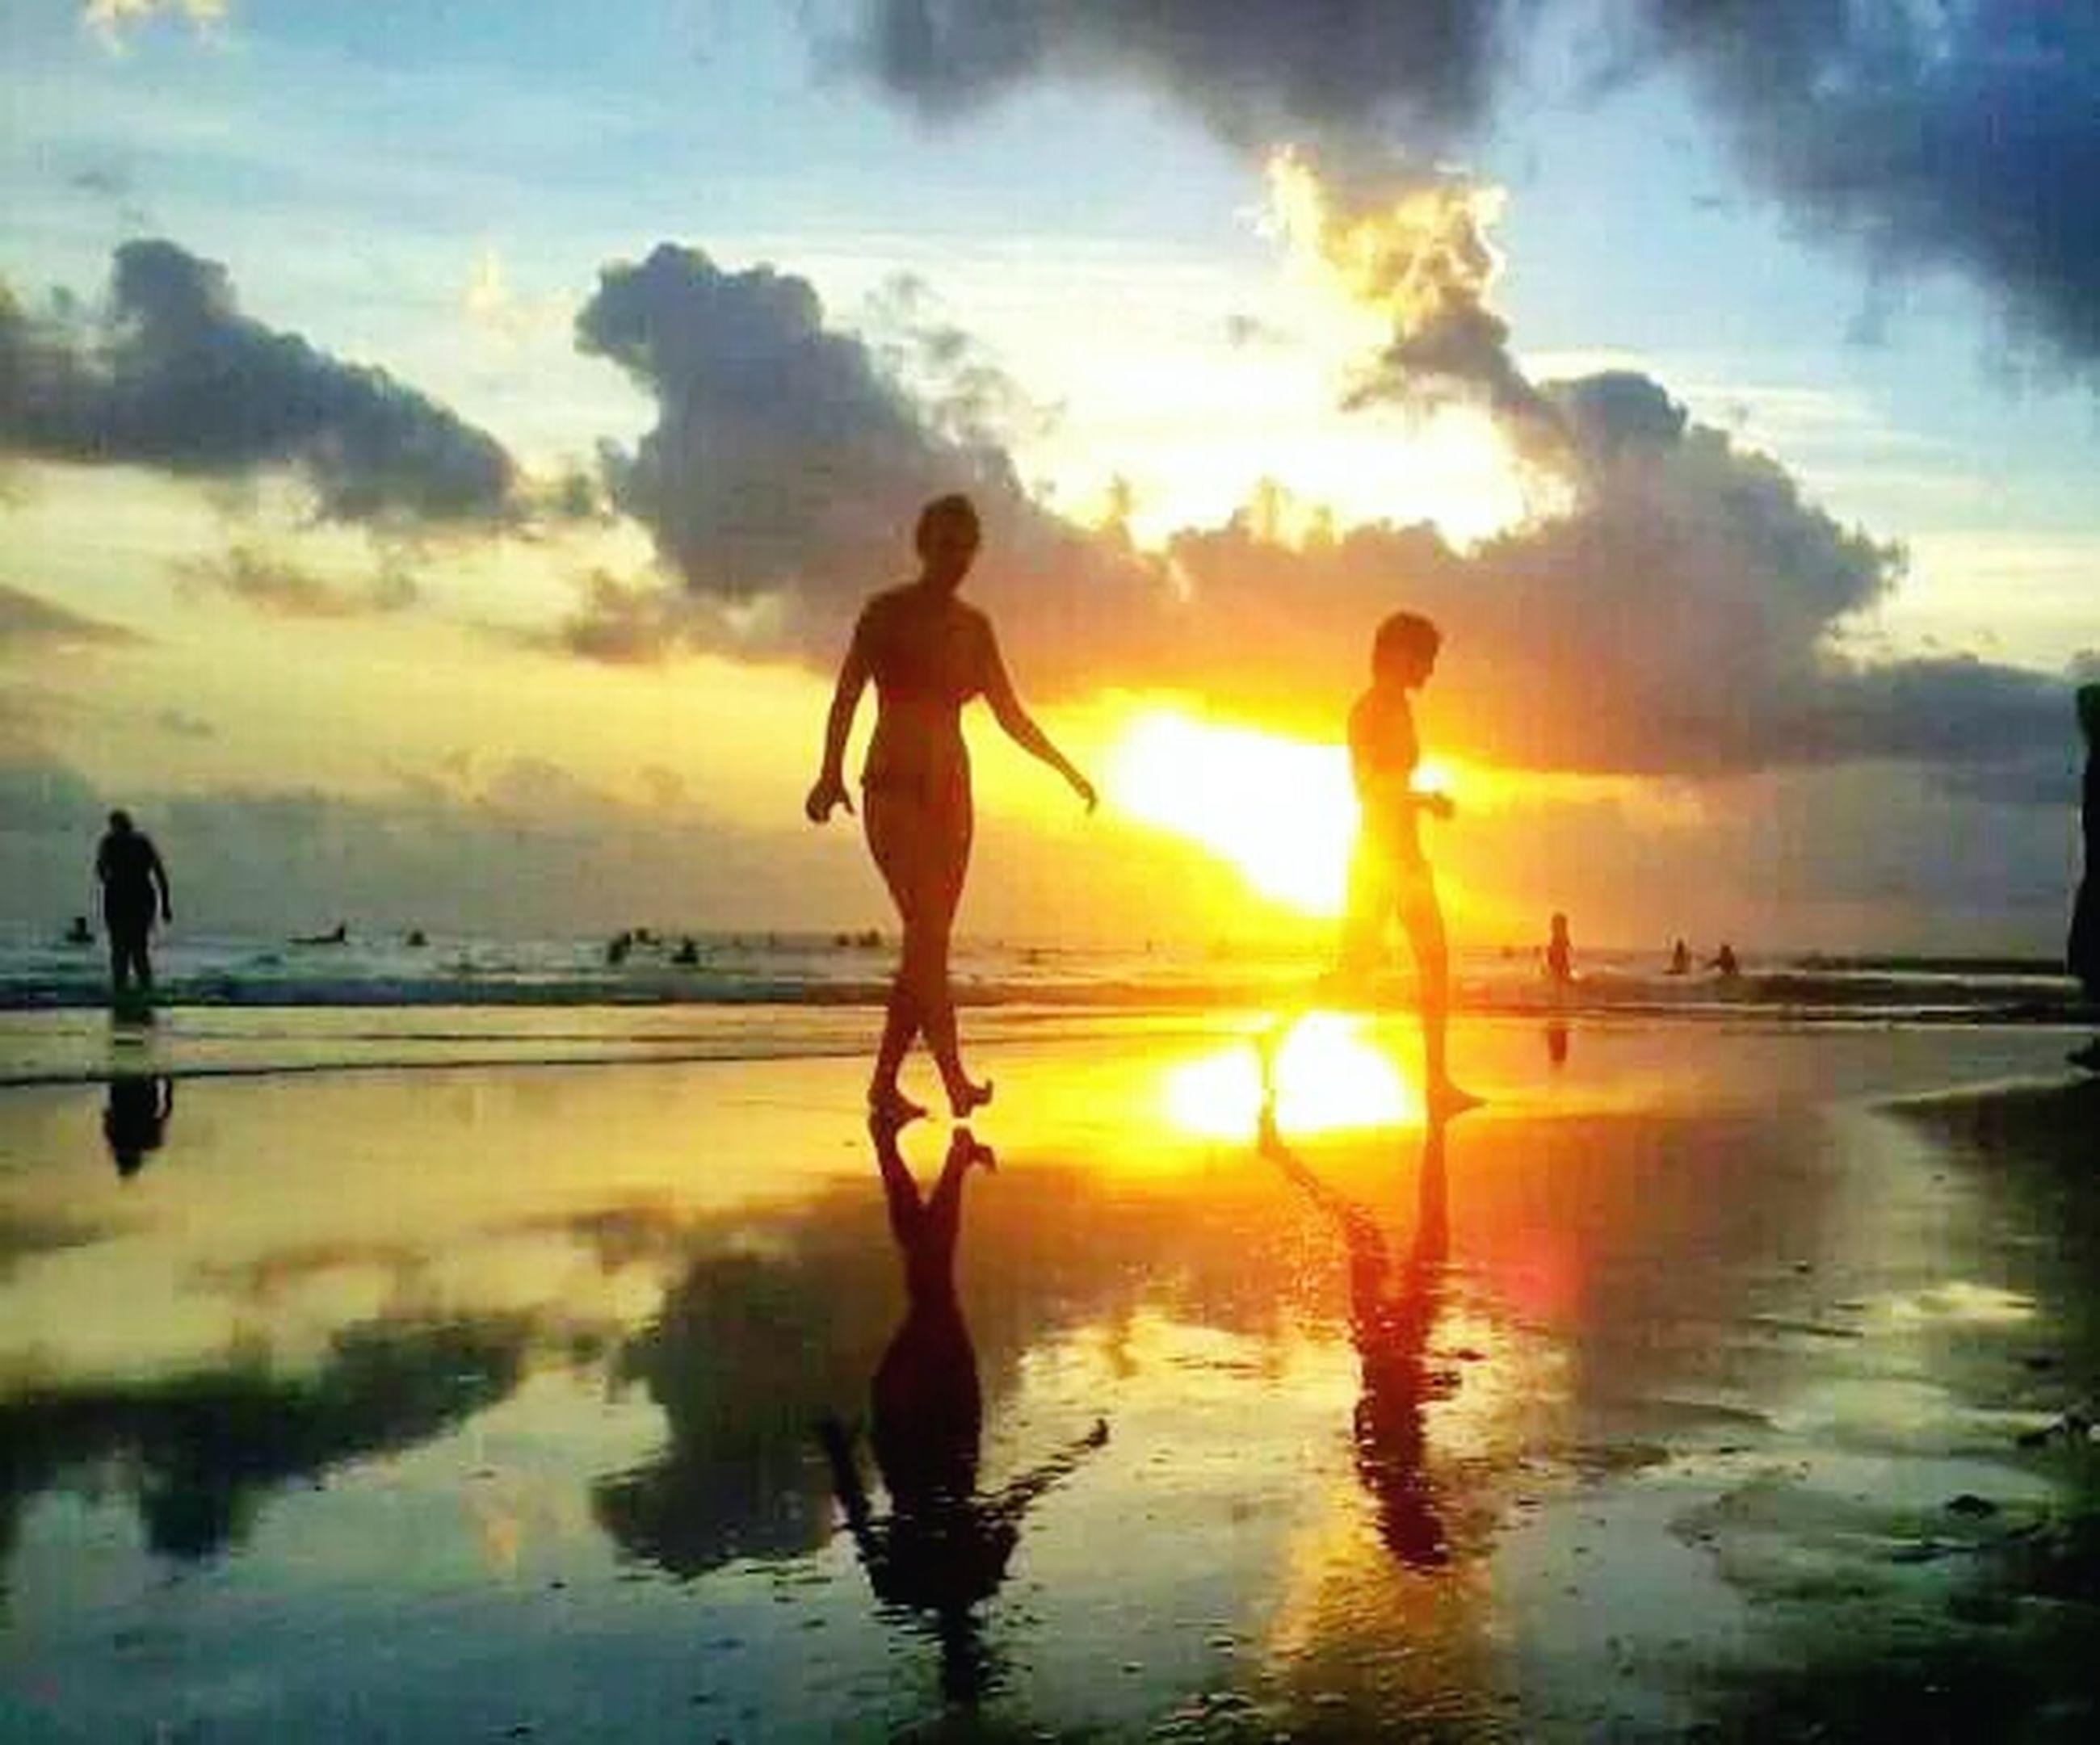 sunset, water, sun, reflection, beach, silhouette, sea, lifestyles, leisure activity, orange color, sky, full length, shore, scenics, horizon over water, boys, childhood, sunlight, standing